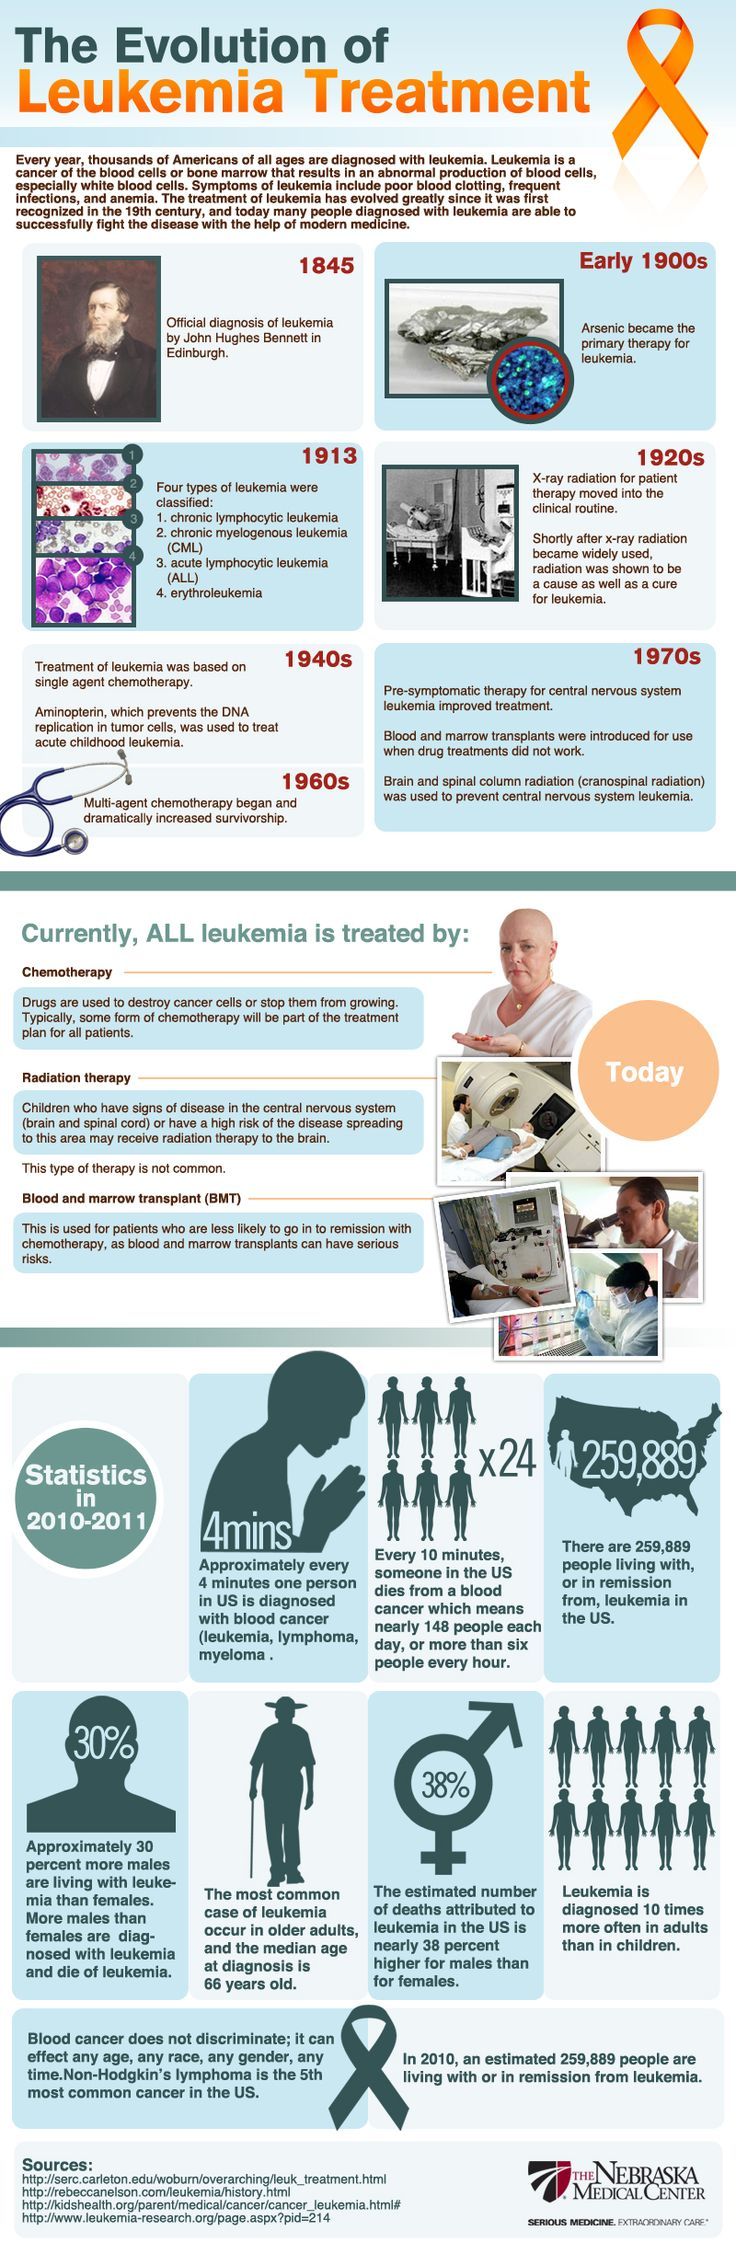 Are you born with leukimia?